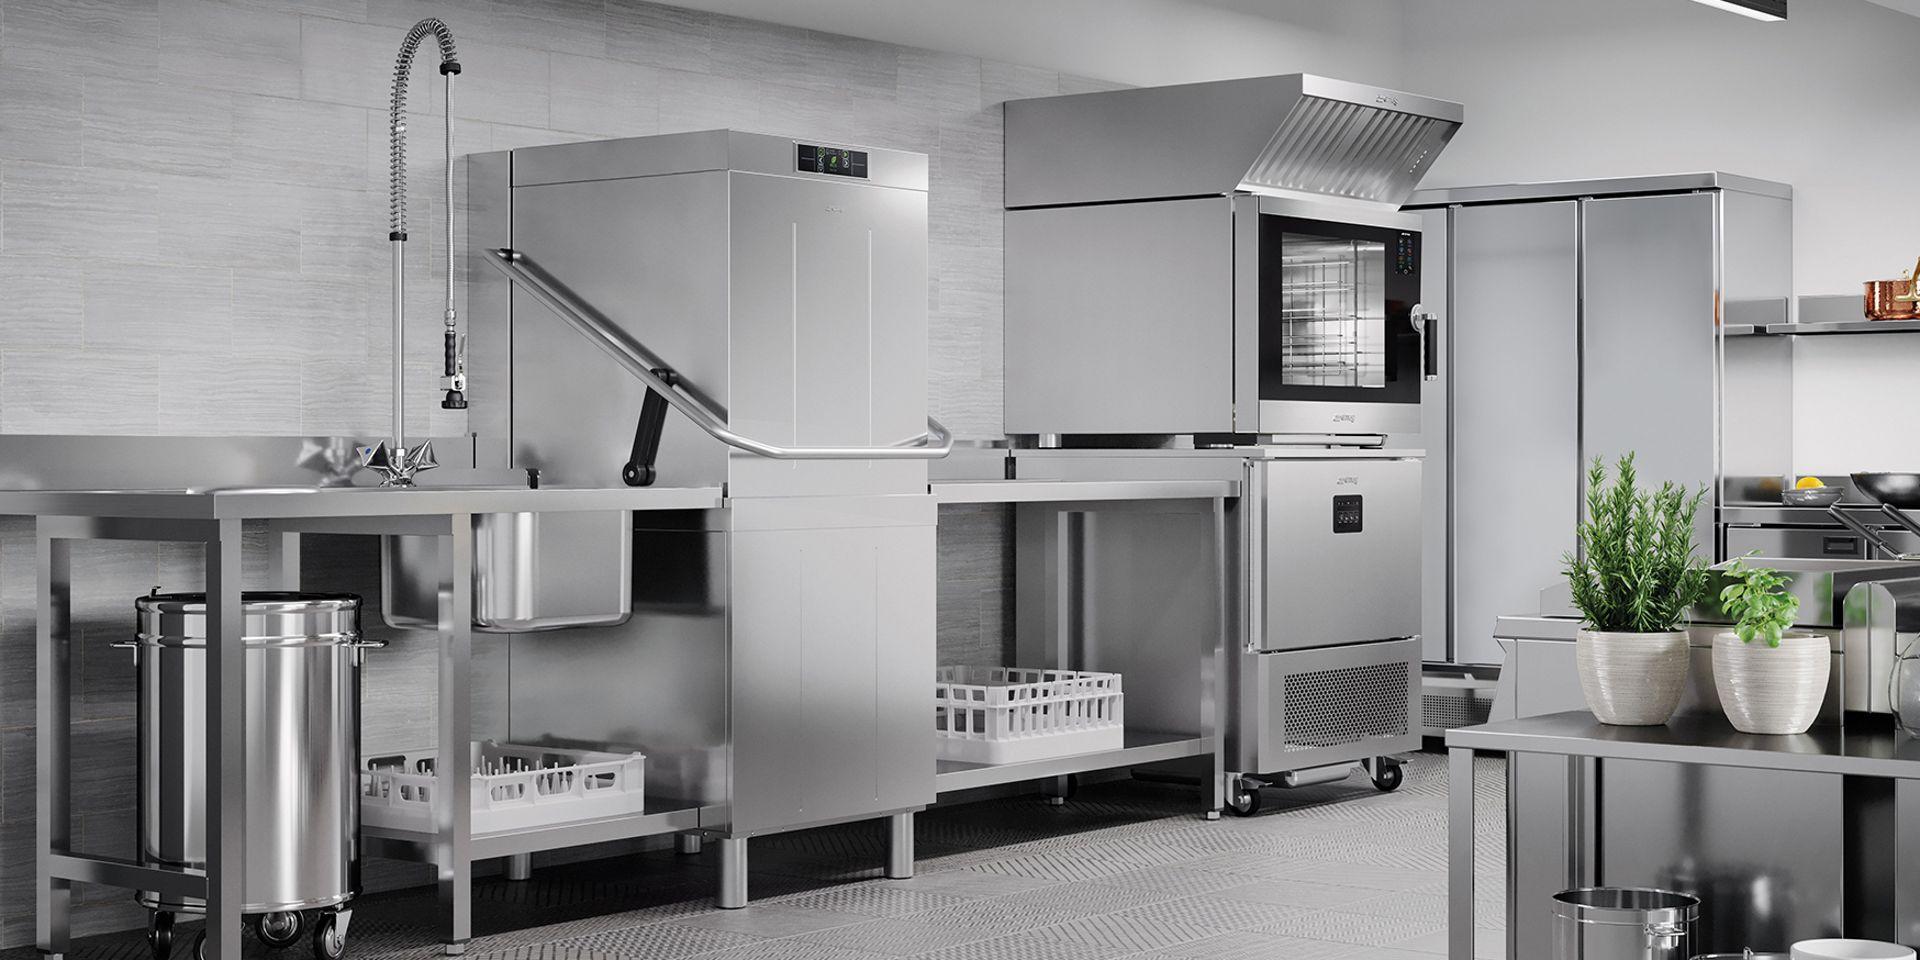 Forno Galileo Professional - Smeg FoodService